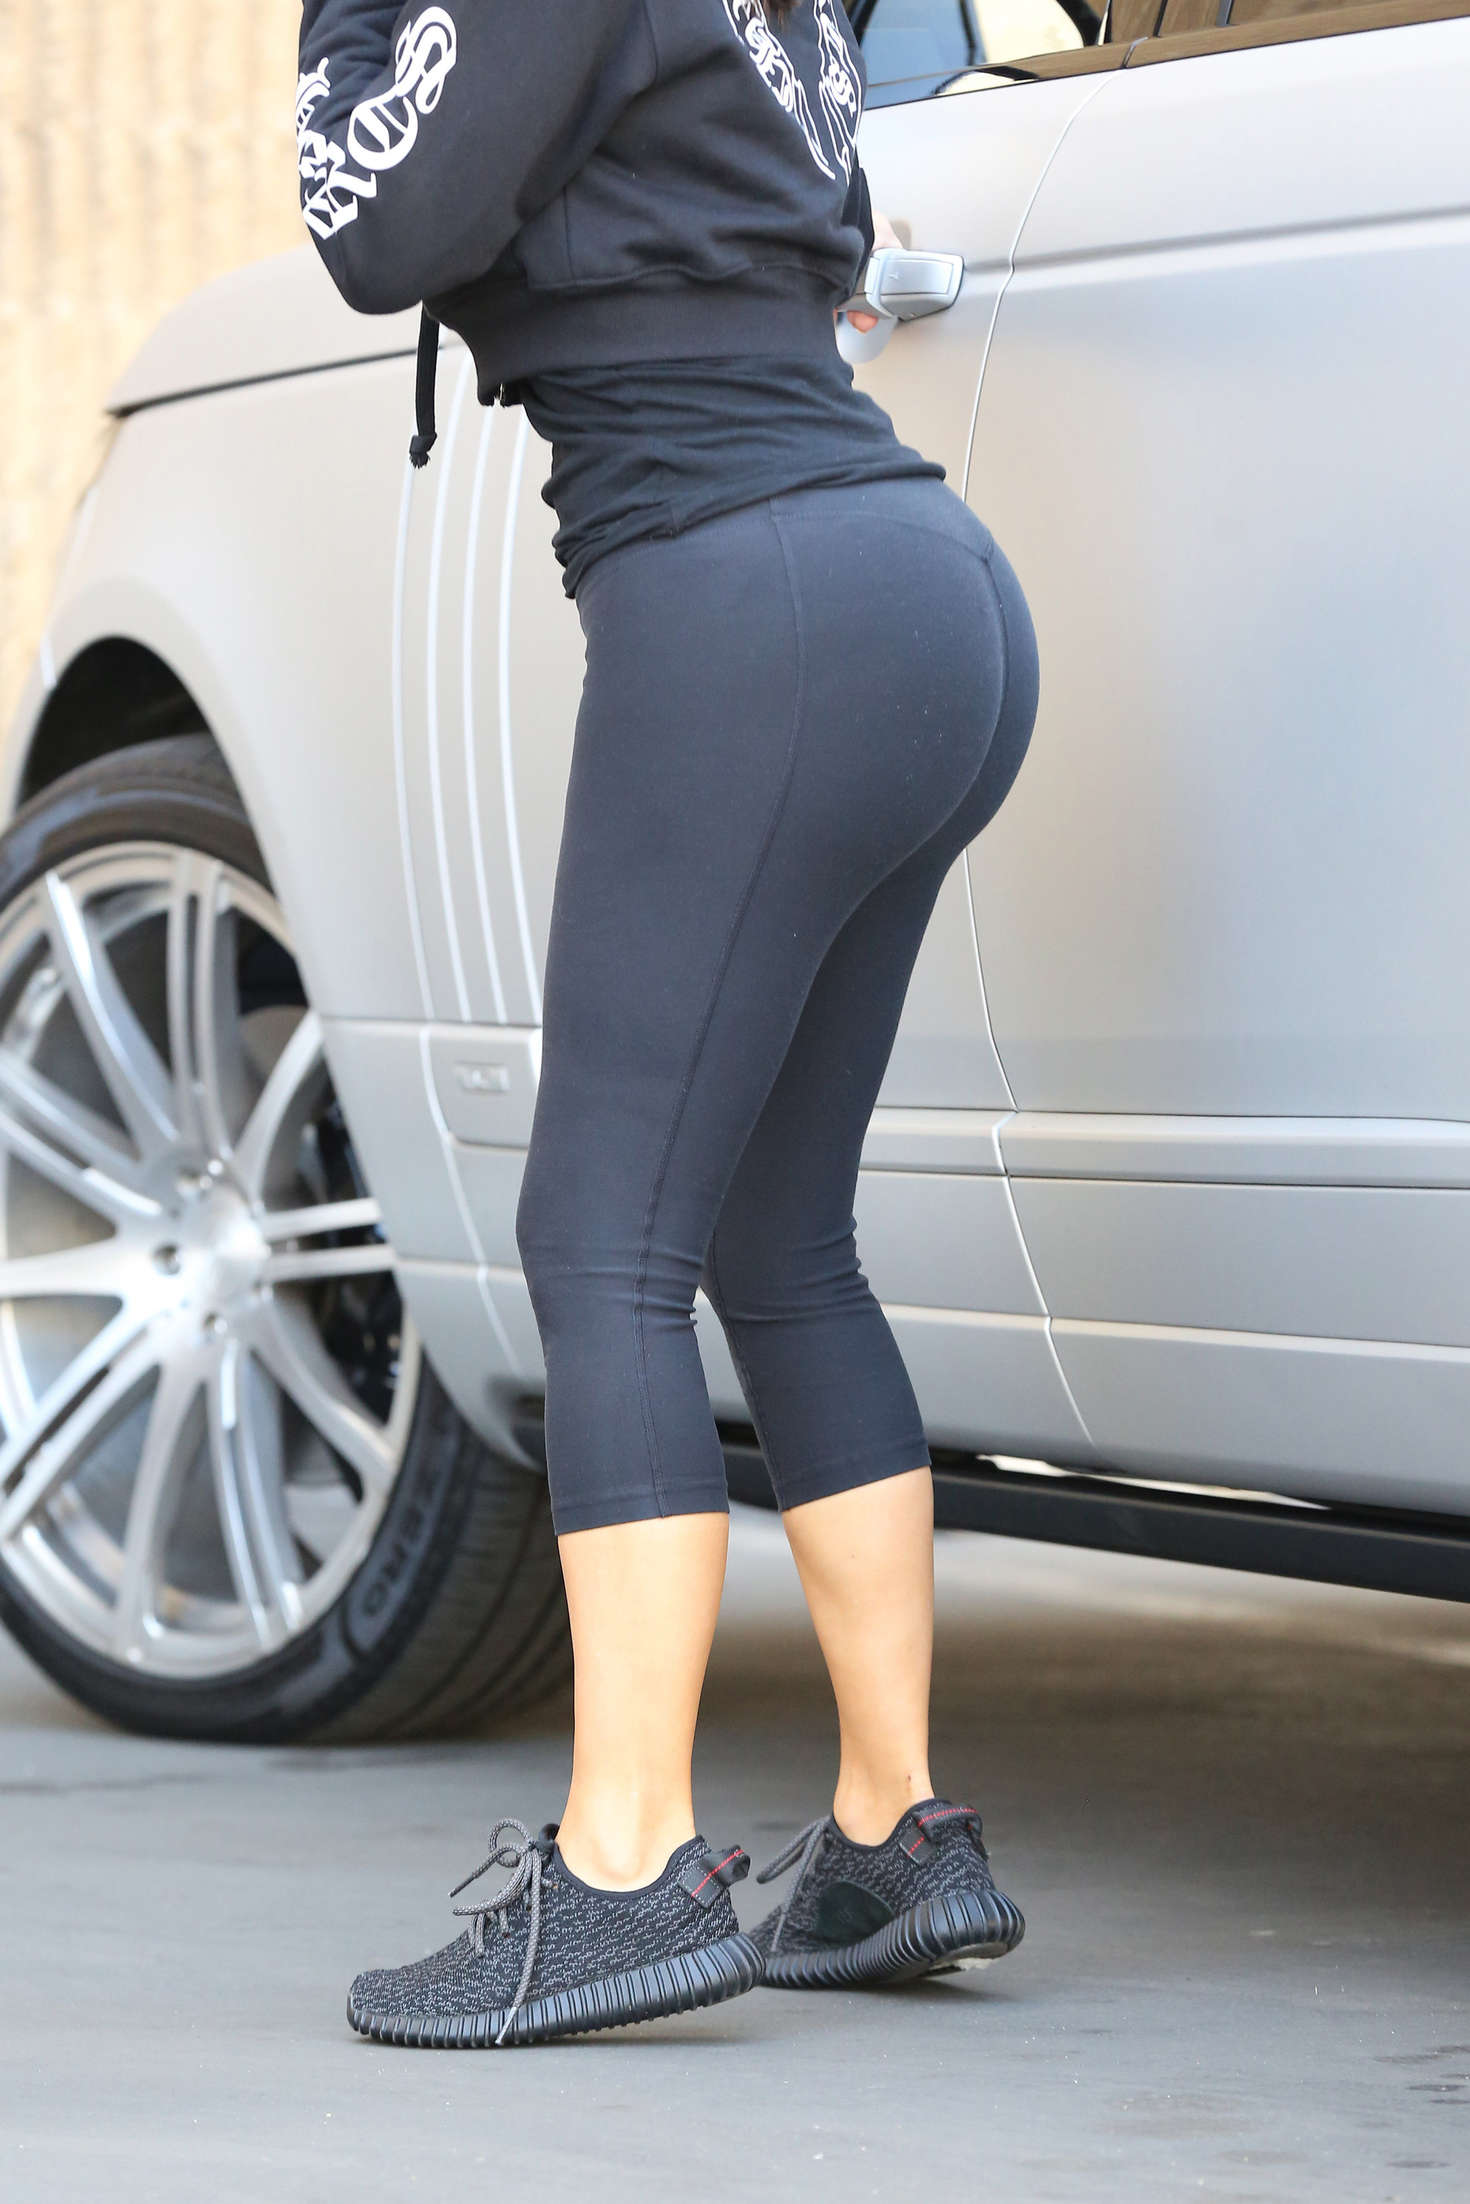 Kim Kardashian In Spandex At Epione 04 Gotceleb